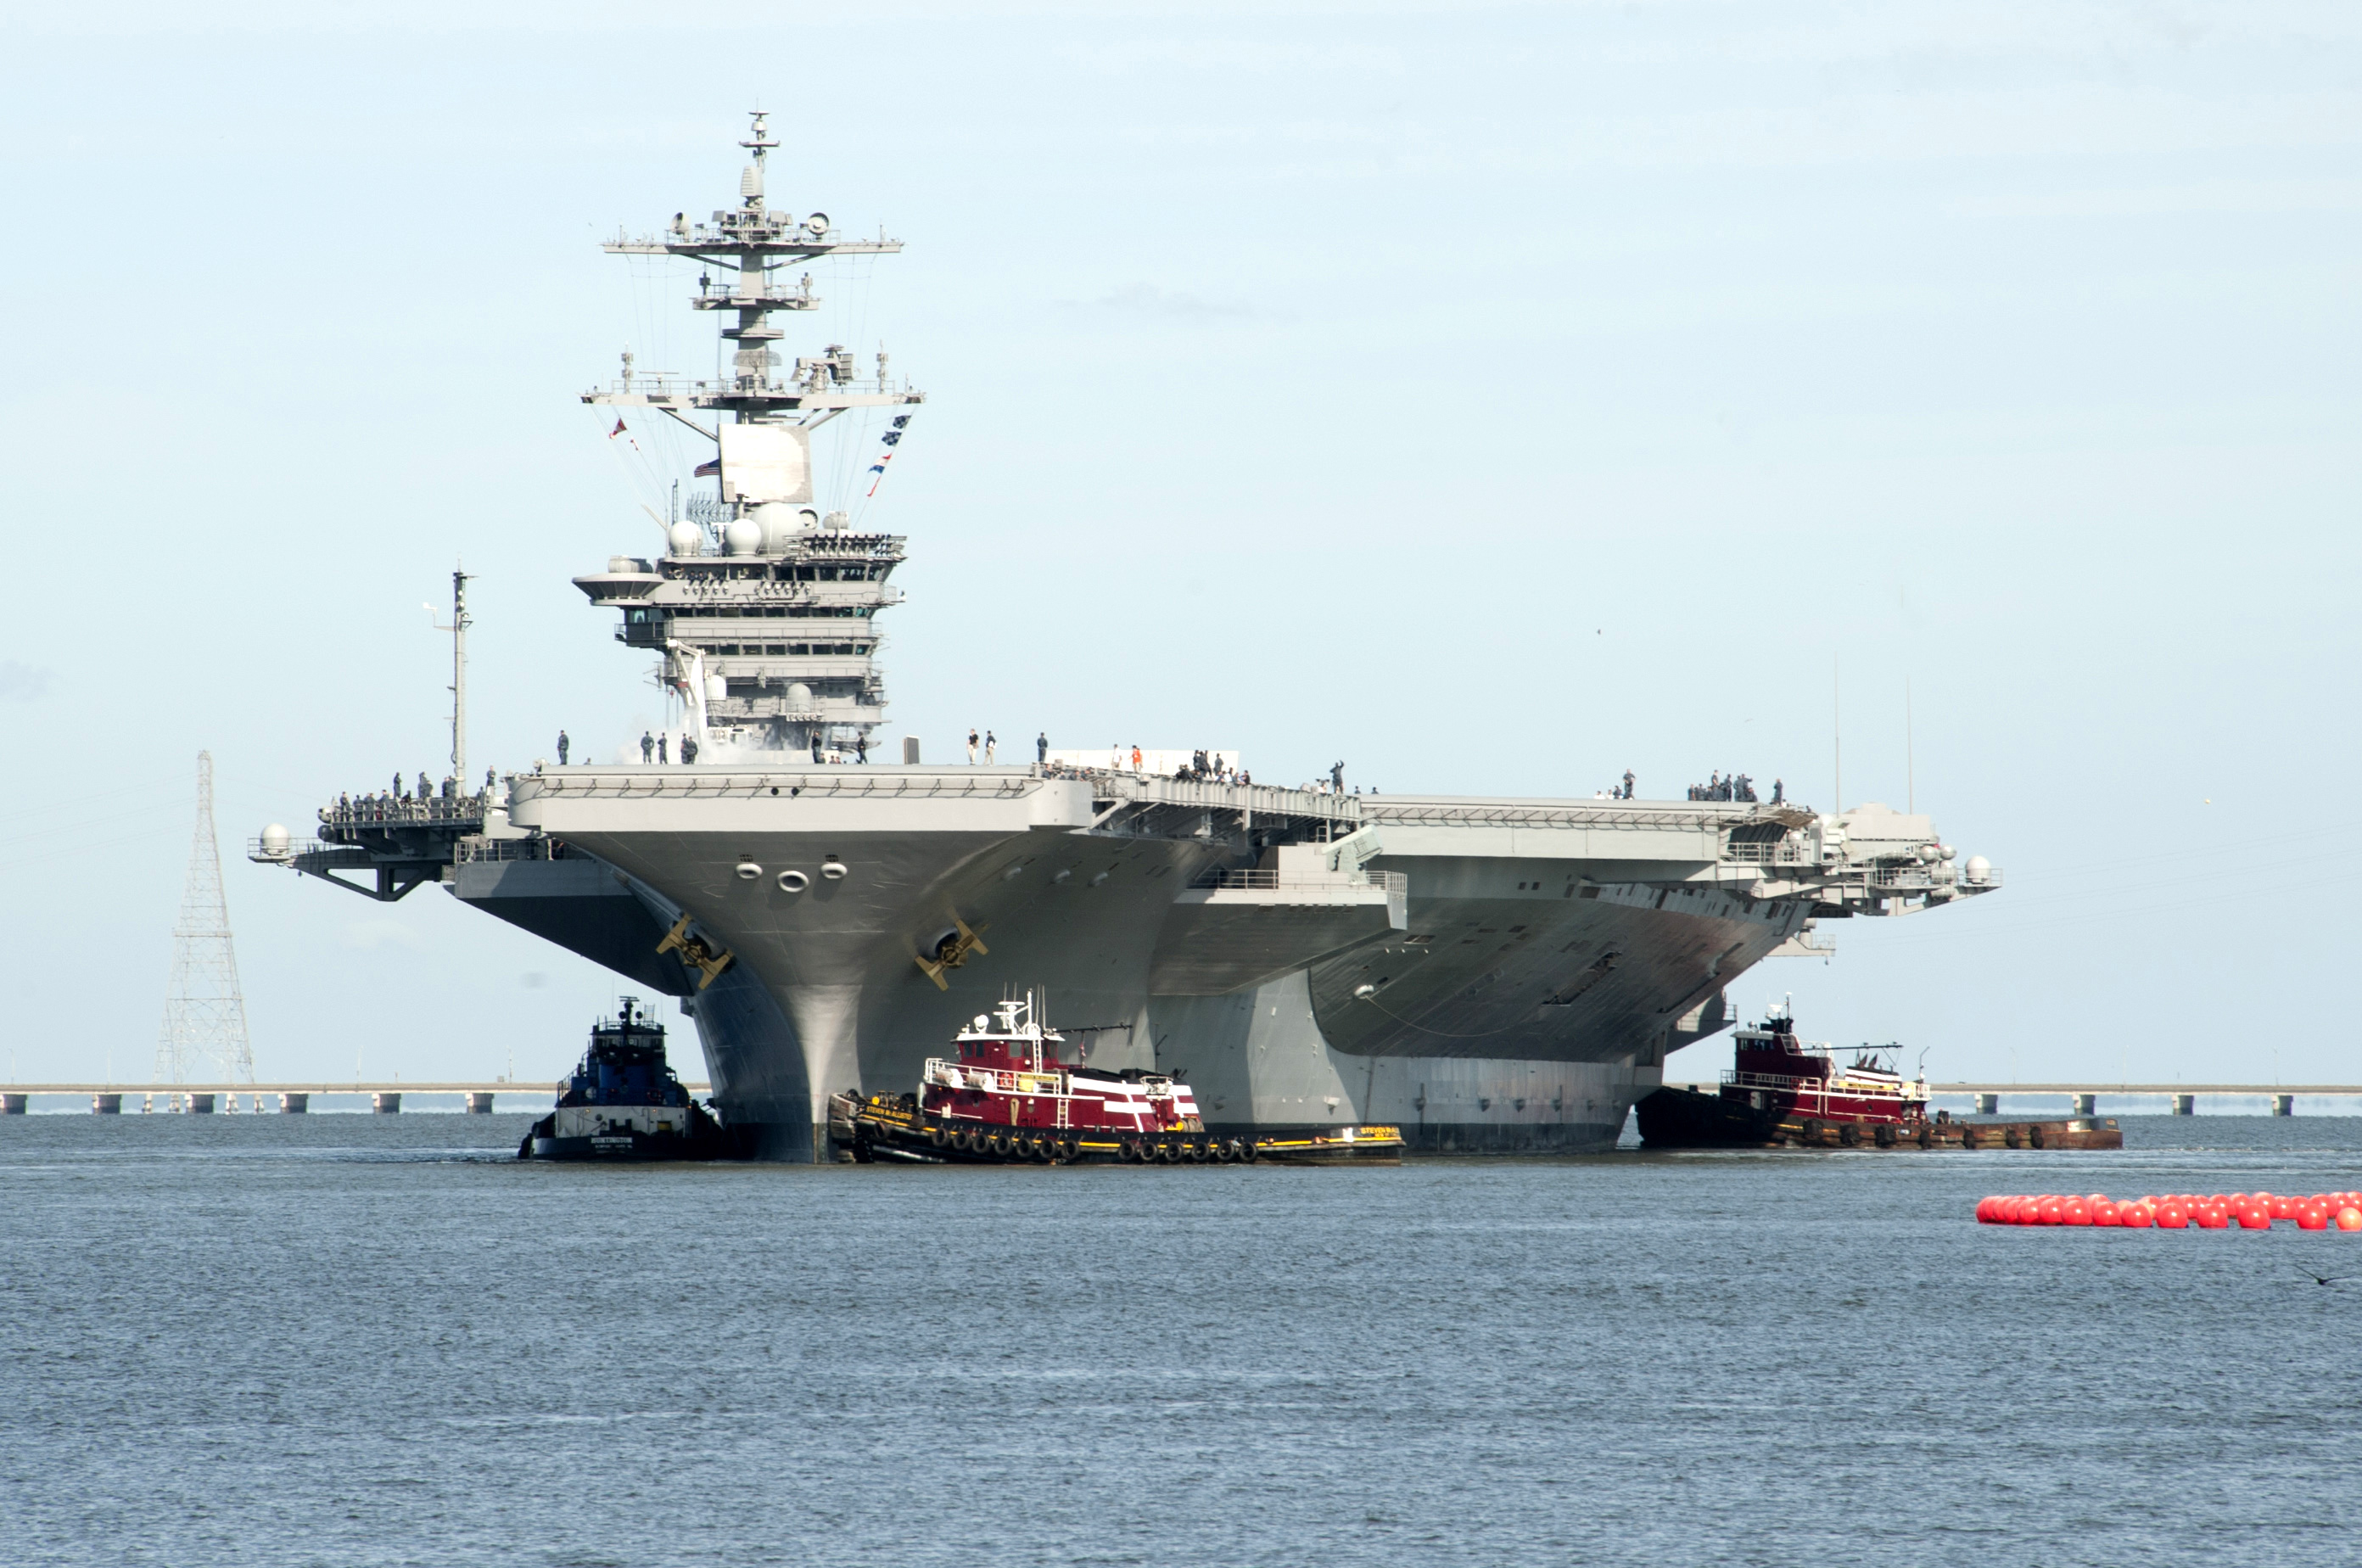 USS THEODORE ROOSEVELT CVN-71 am 25.08.2013Bild: U.S. Navy